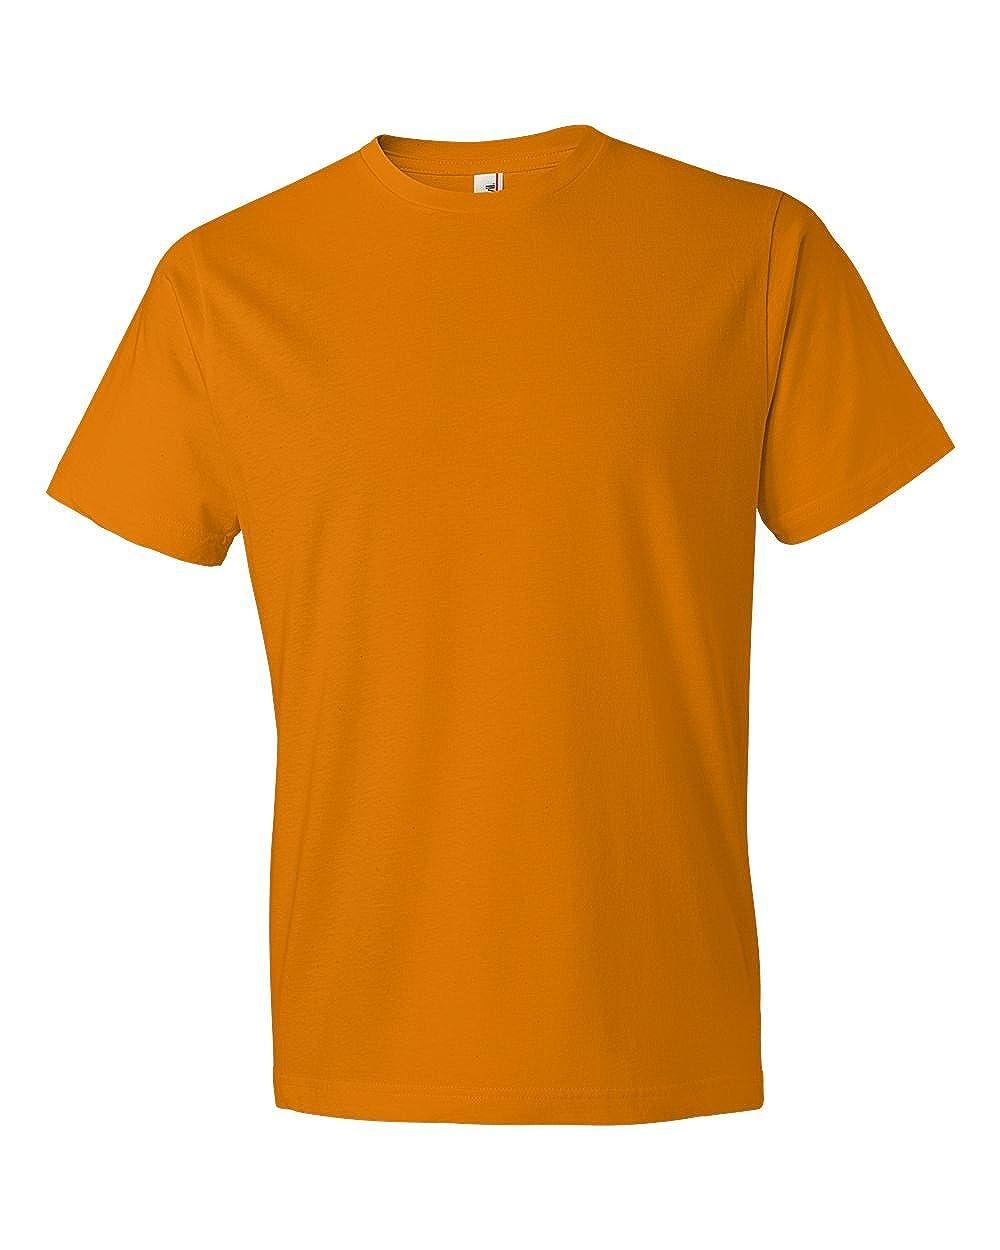 Anvil Lightweight T-Shirt MANDARIN ORANGE 980